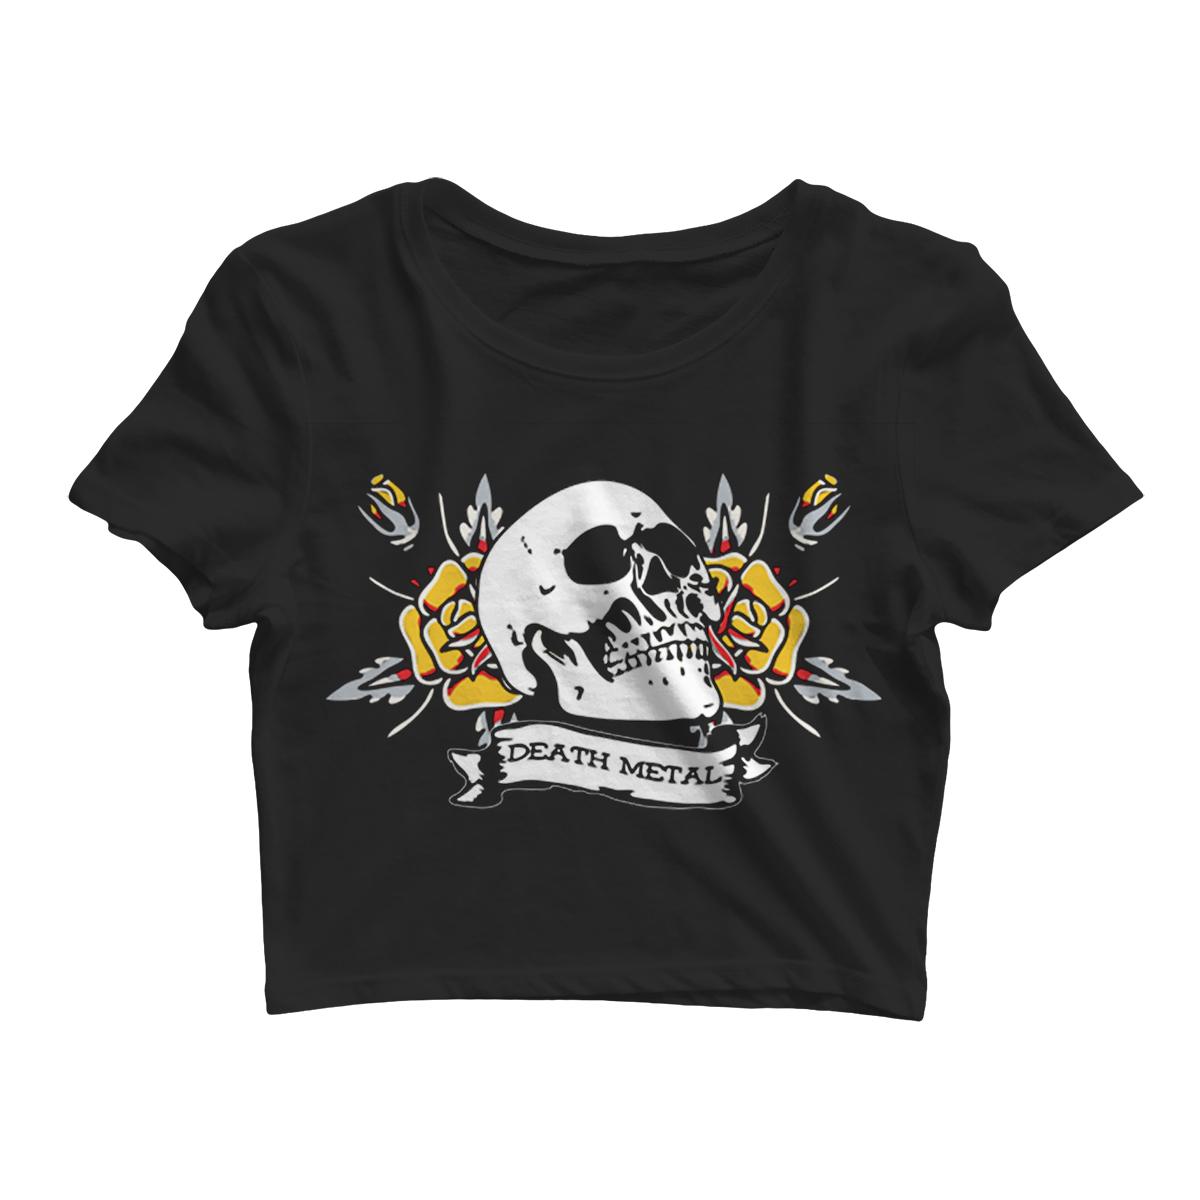 Death Metal - Black Crop Top